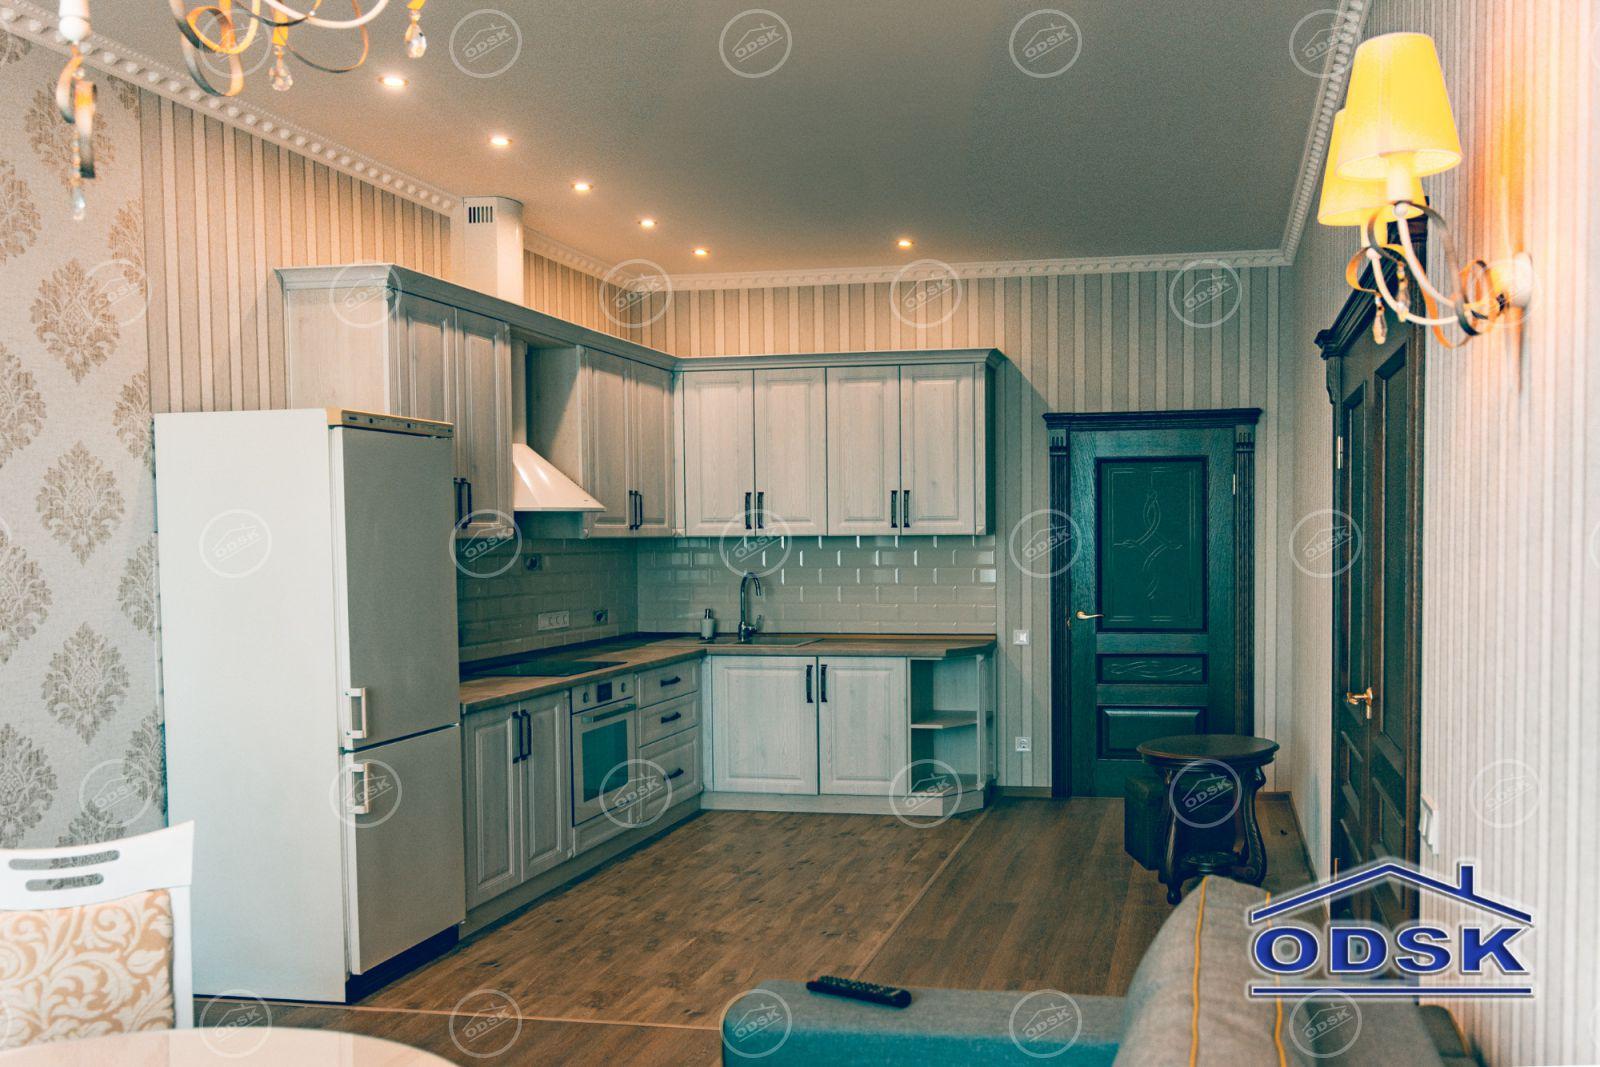 Пример ремонта кухни под ключ №5.